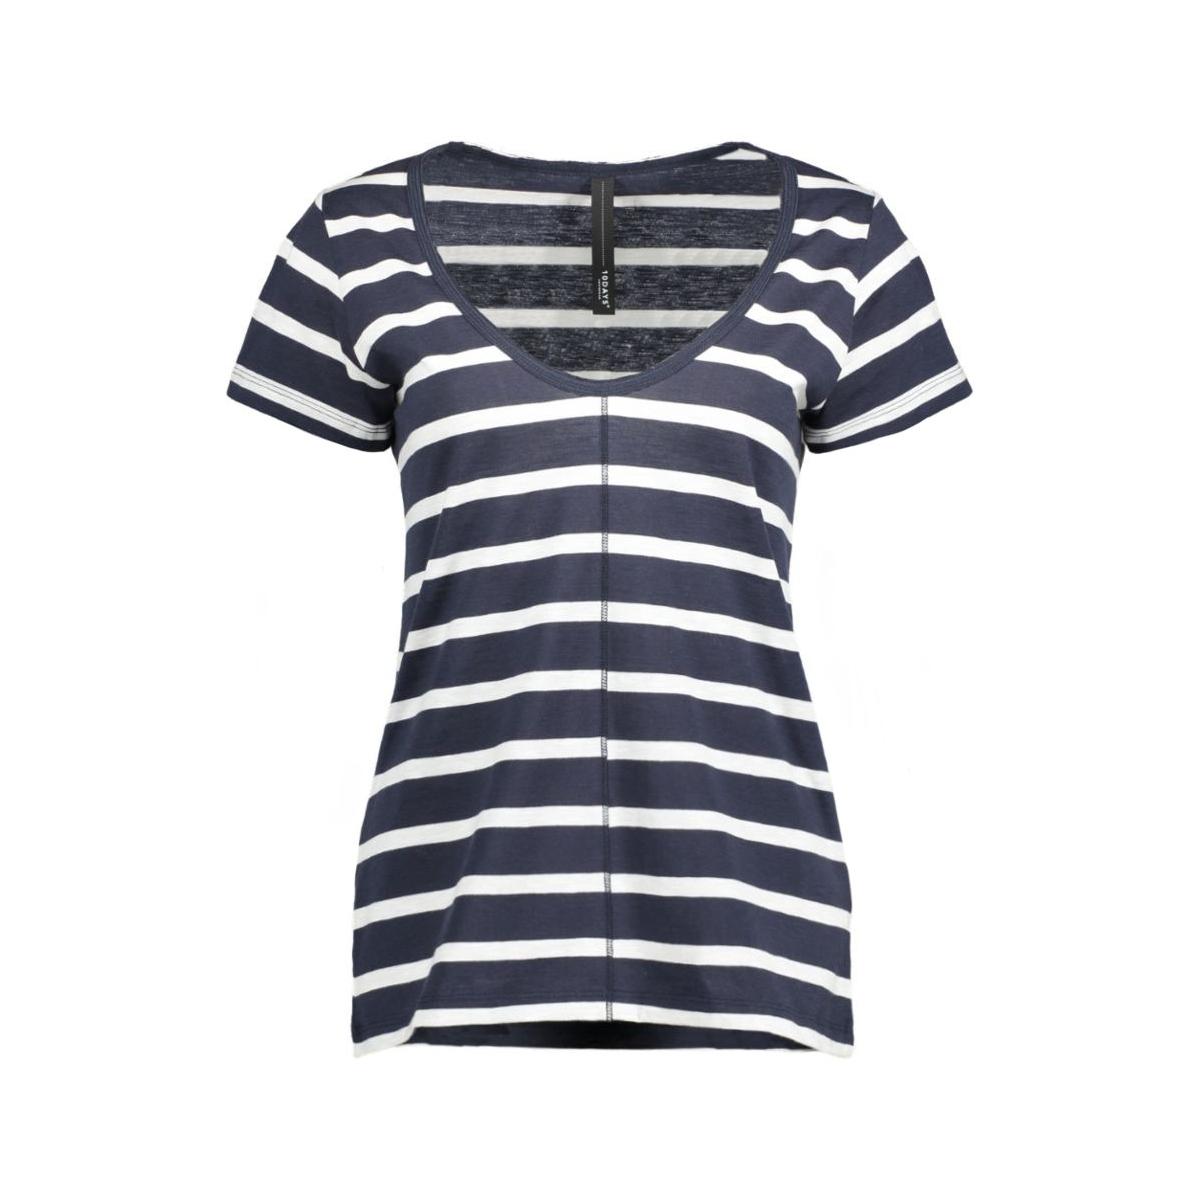 16wi743s 10 days t-shirt black blue/ ecru